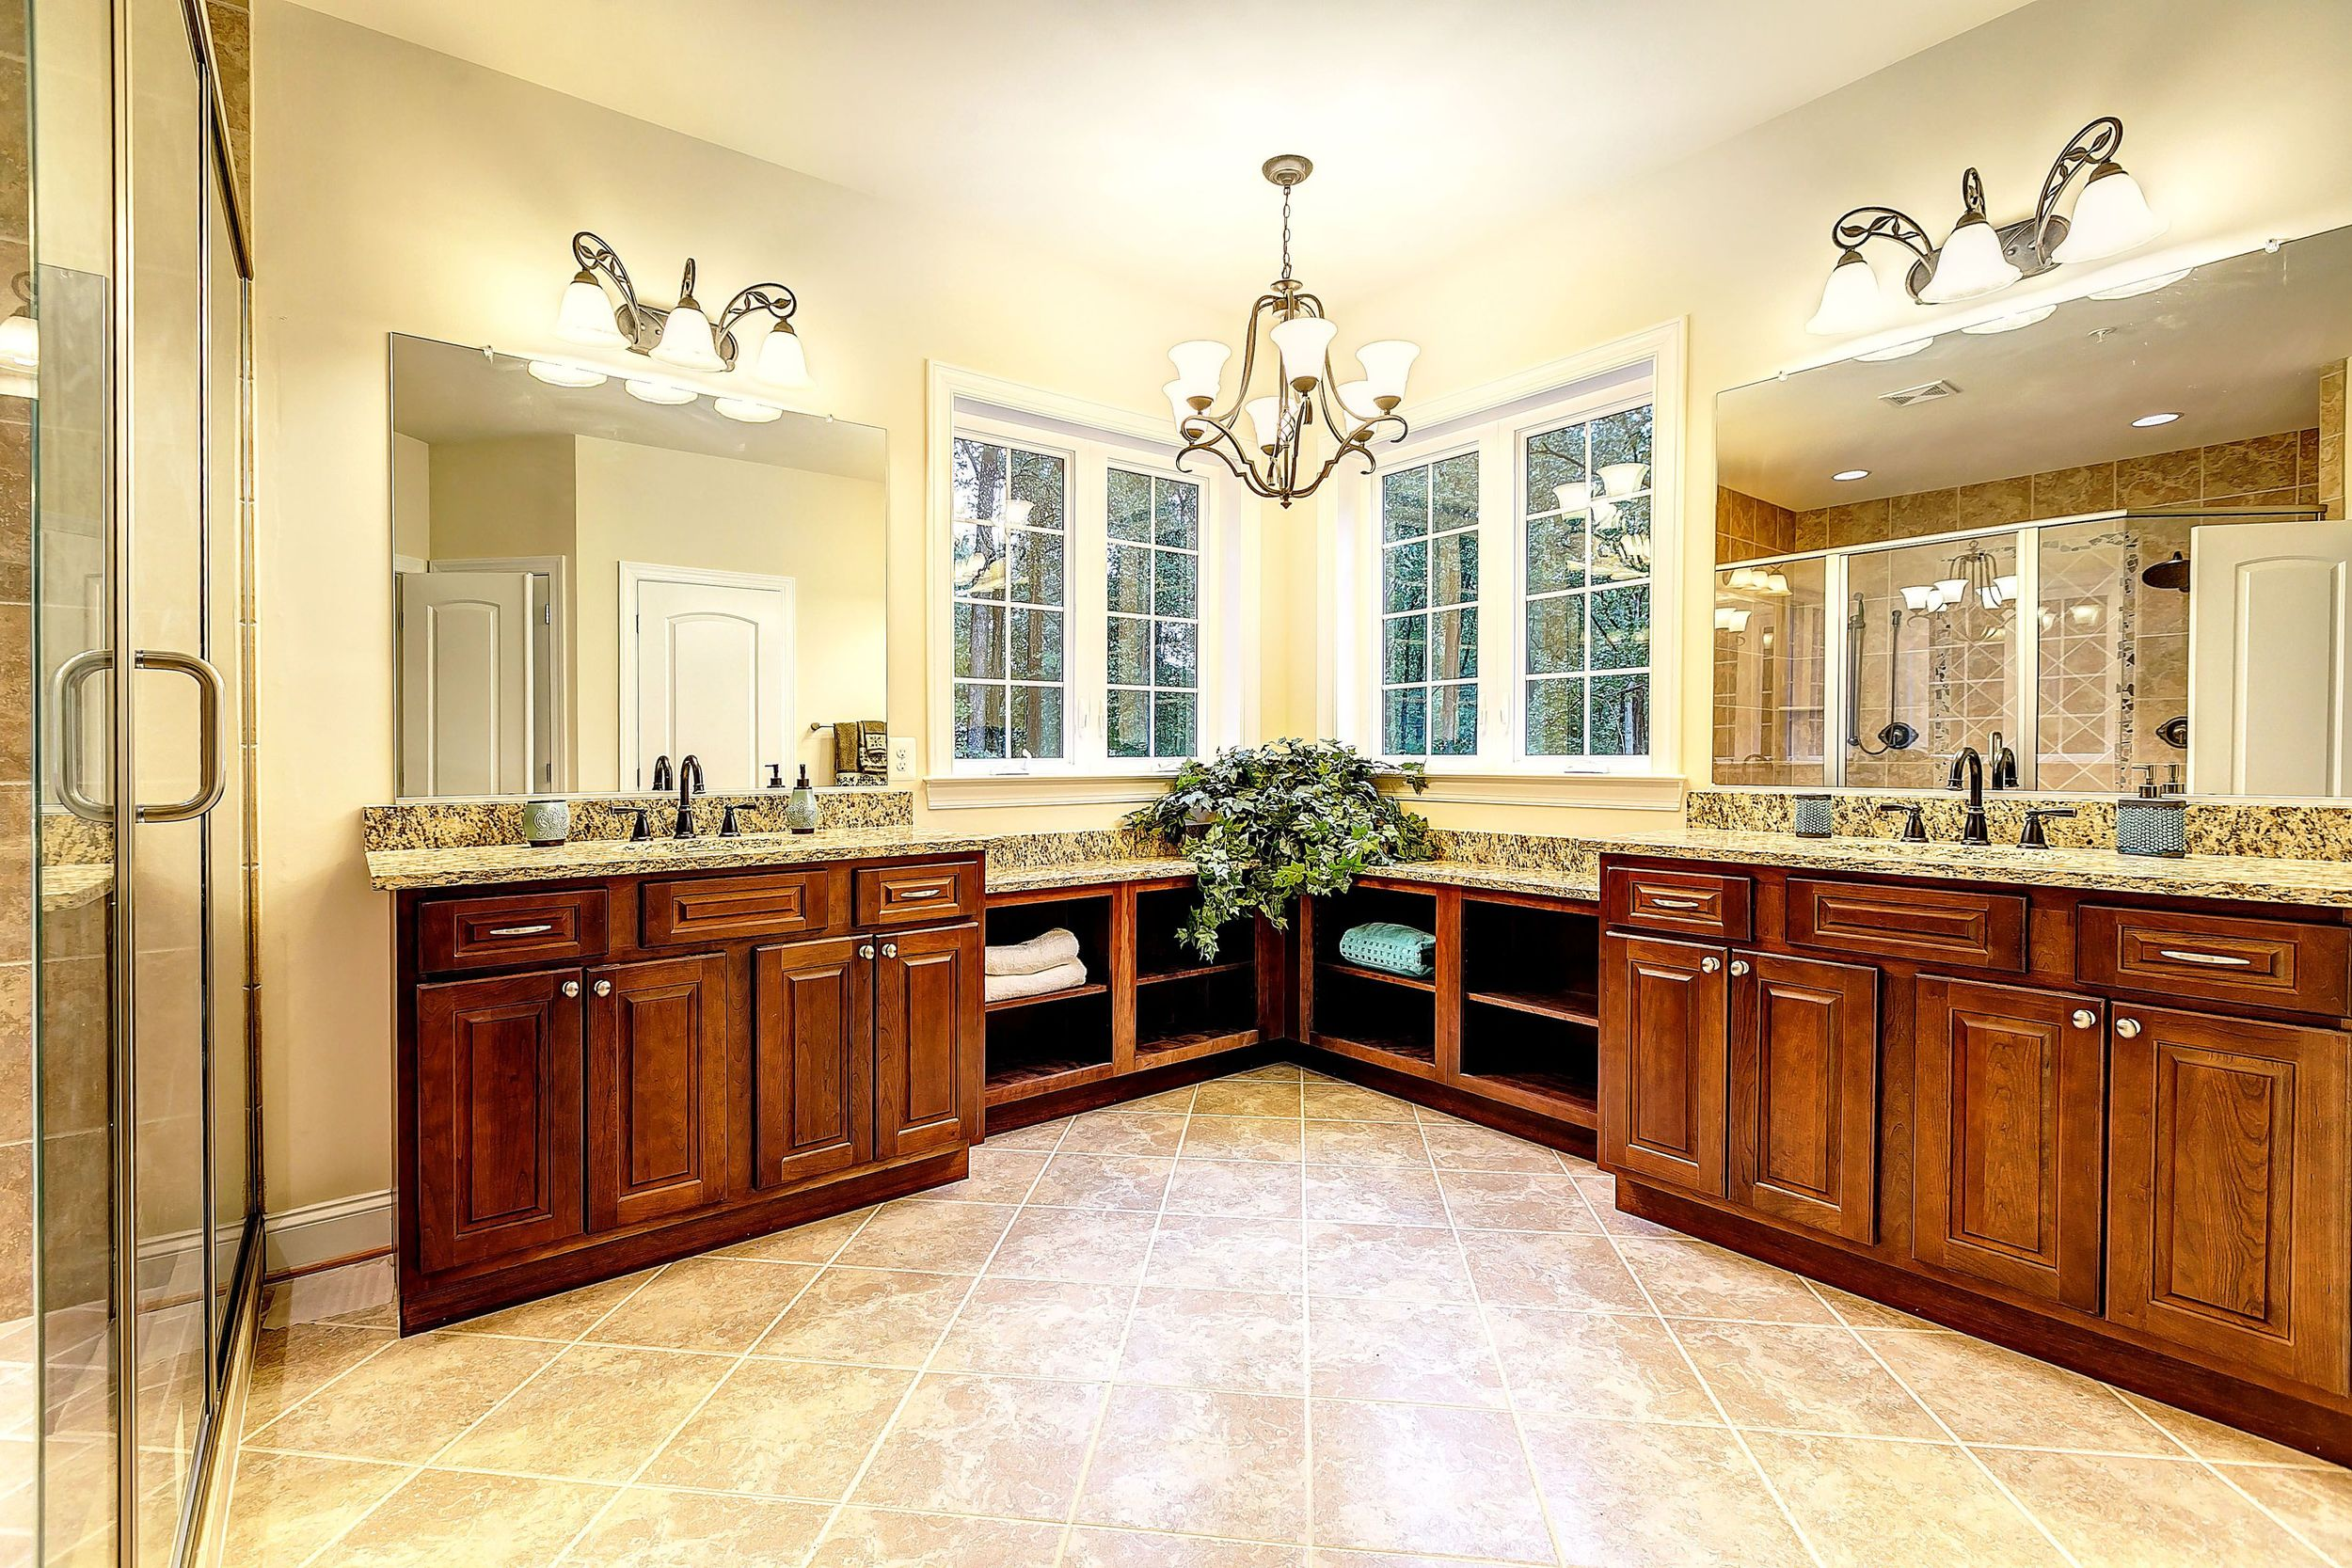 rylea-homes-custom-home-17.jpg